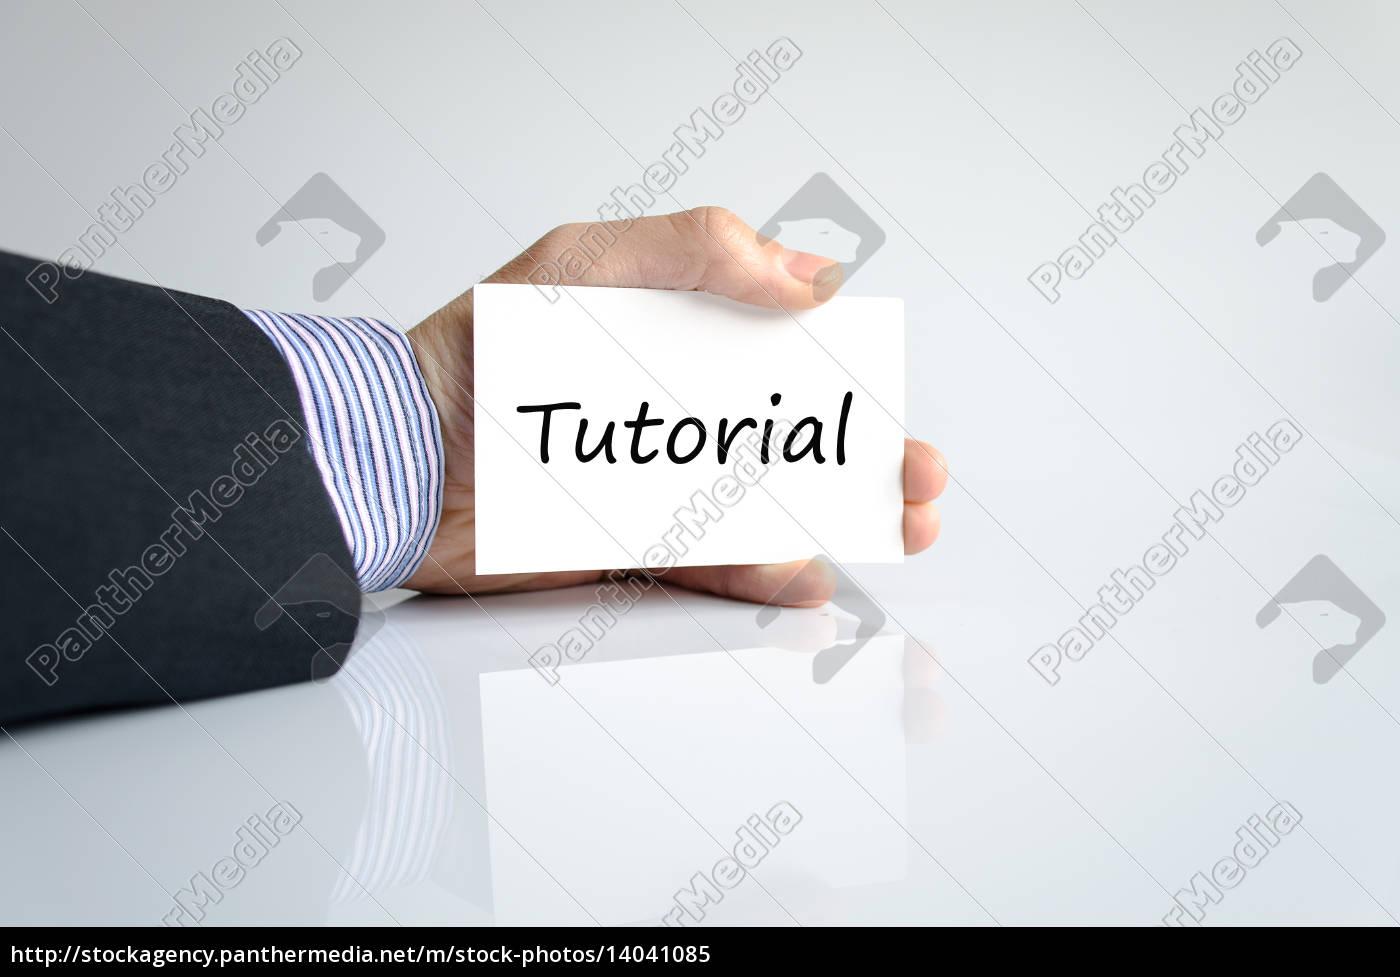 study, seminar, presentation, consultation, consultancy, consulting - 14041085